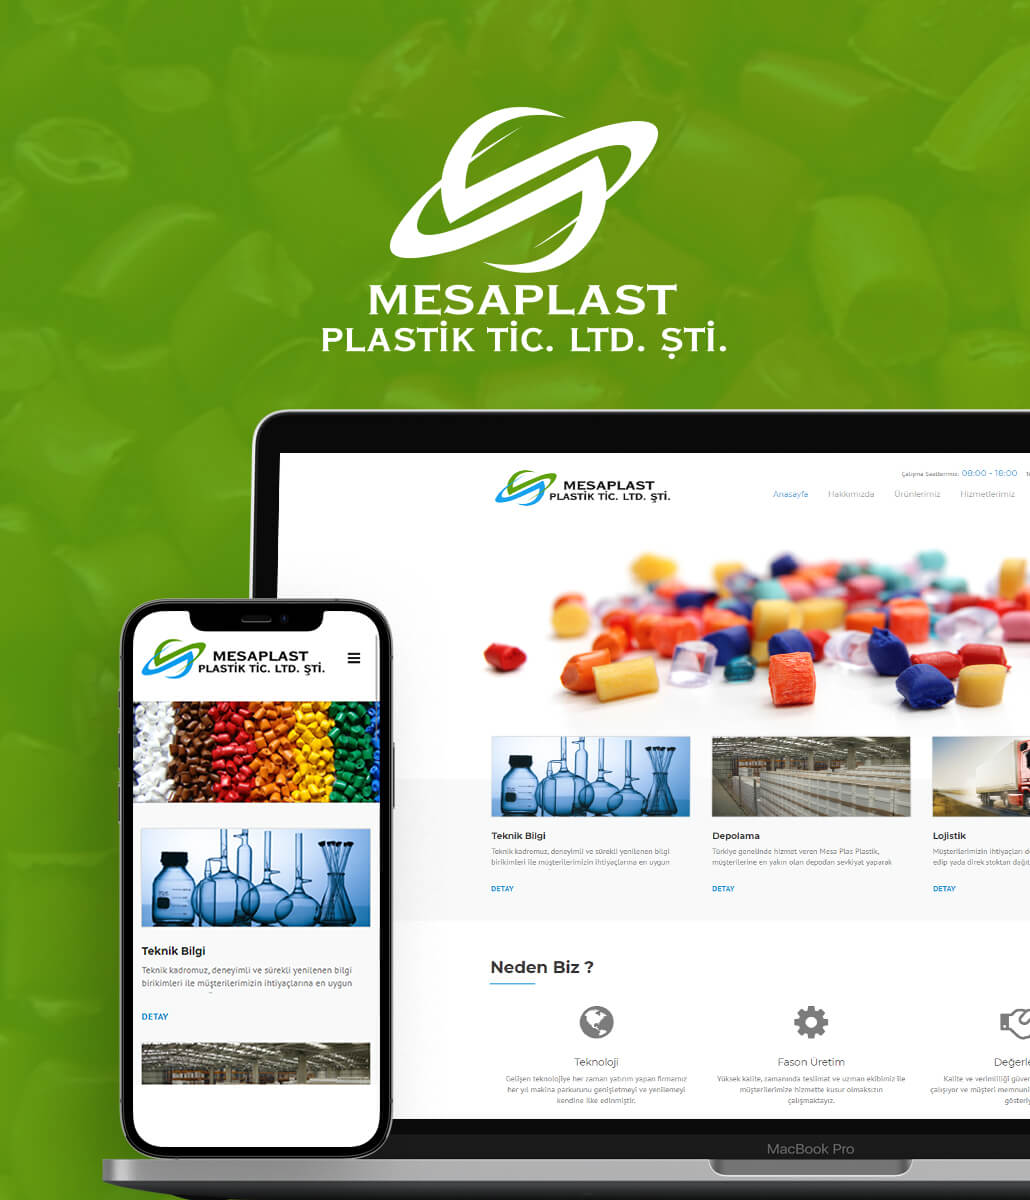 MesaPlast Plastik Tic. Ltd. Şti. Kurumsal Web Sitesi